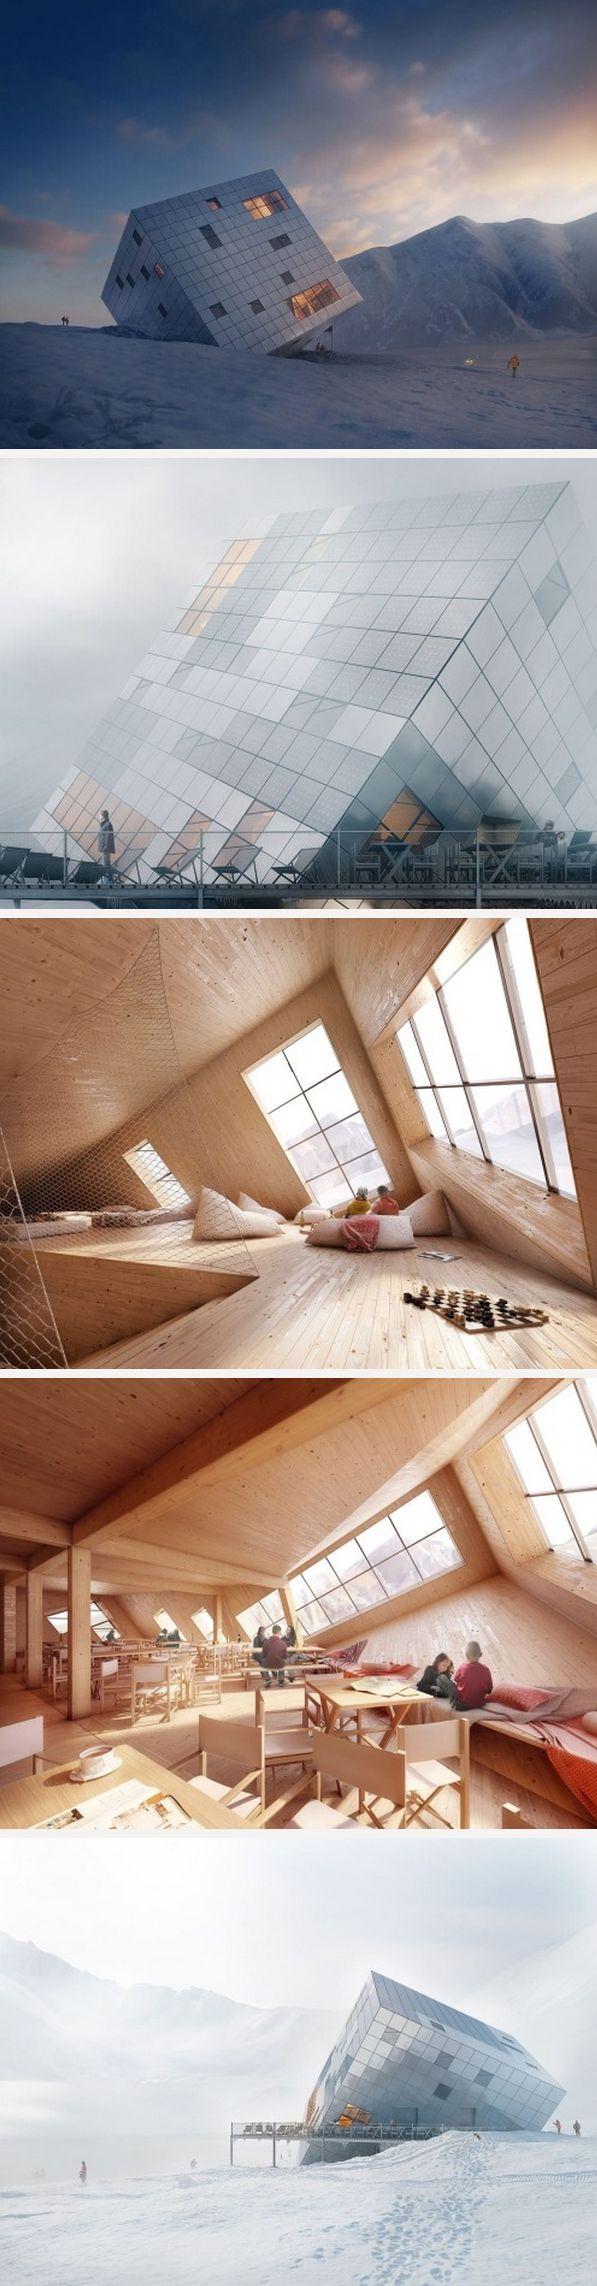 #Espacios inclinados #Arquitectura